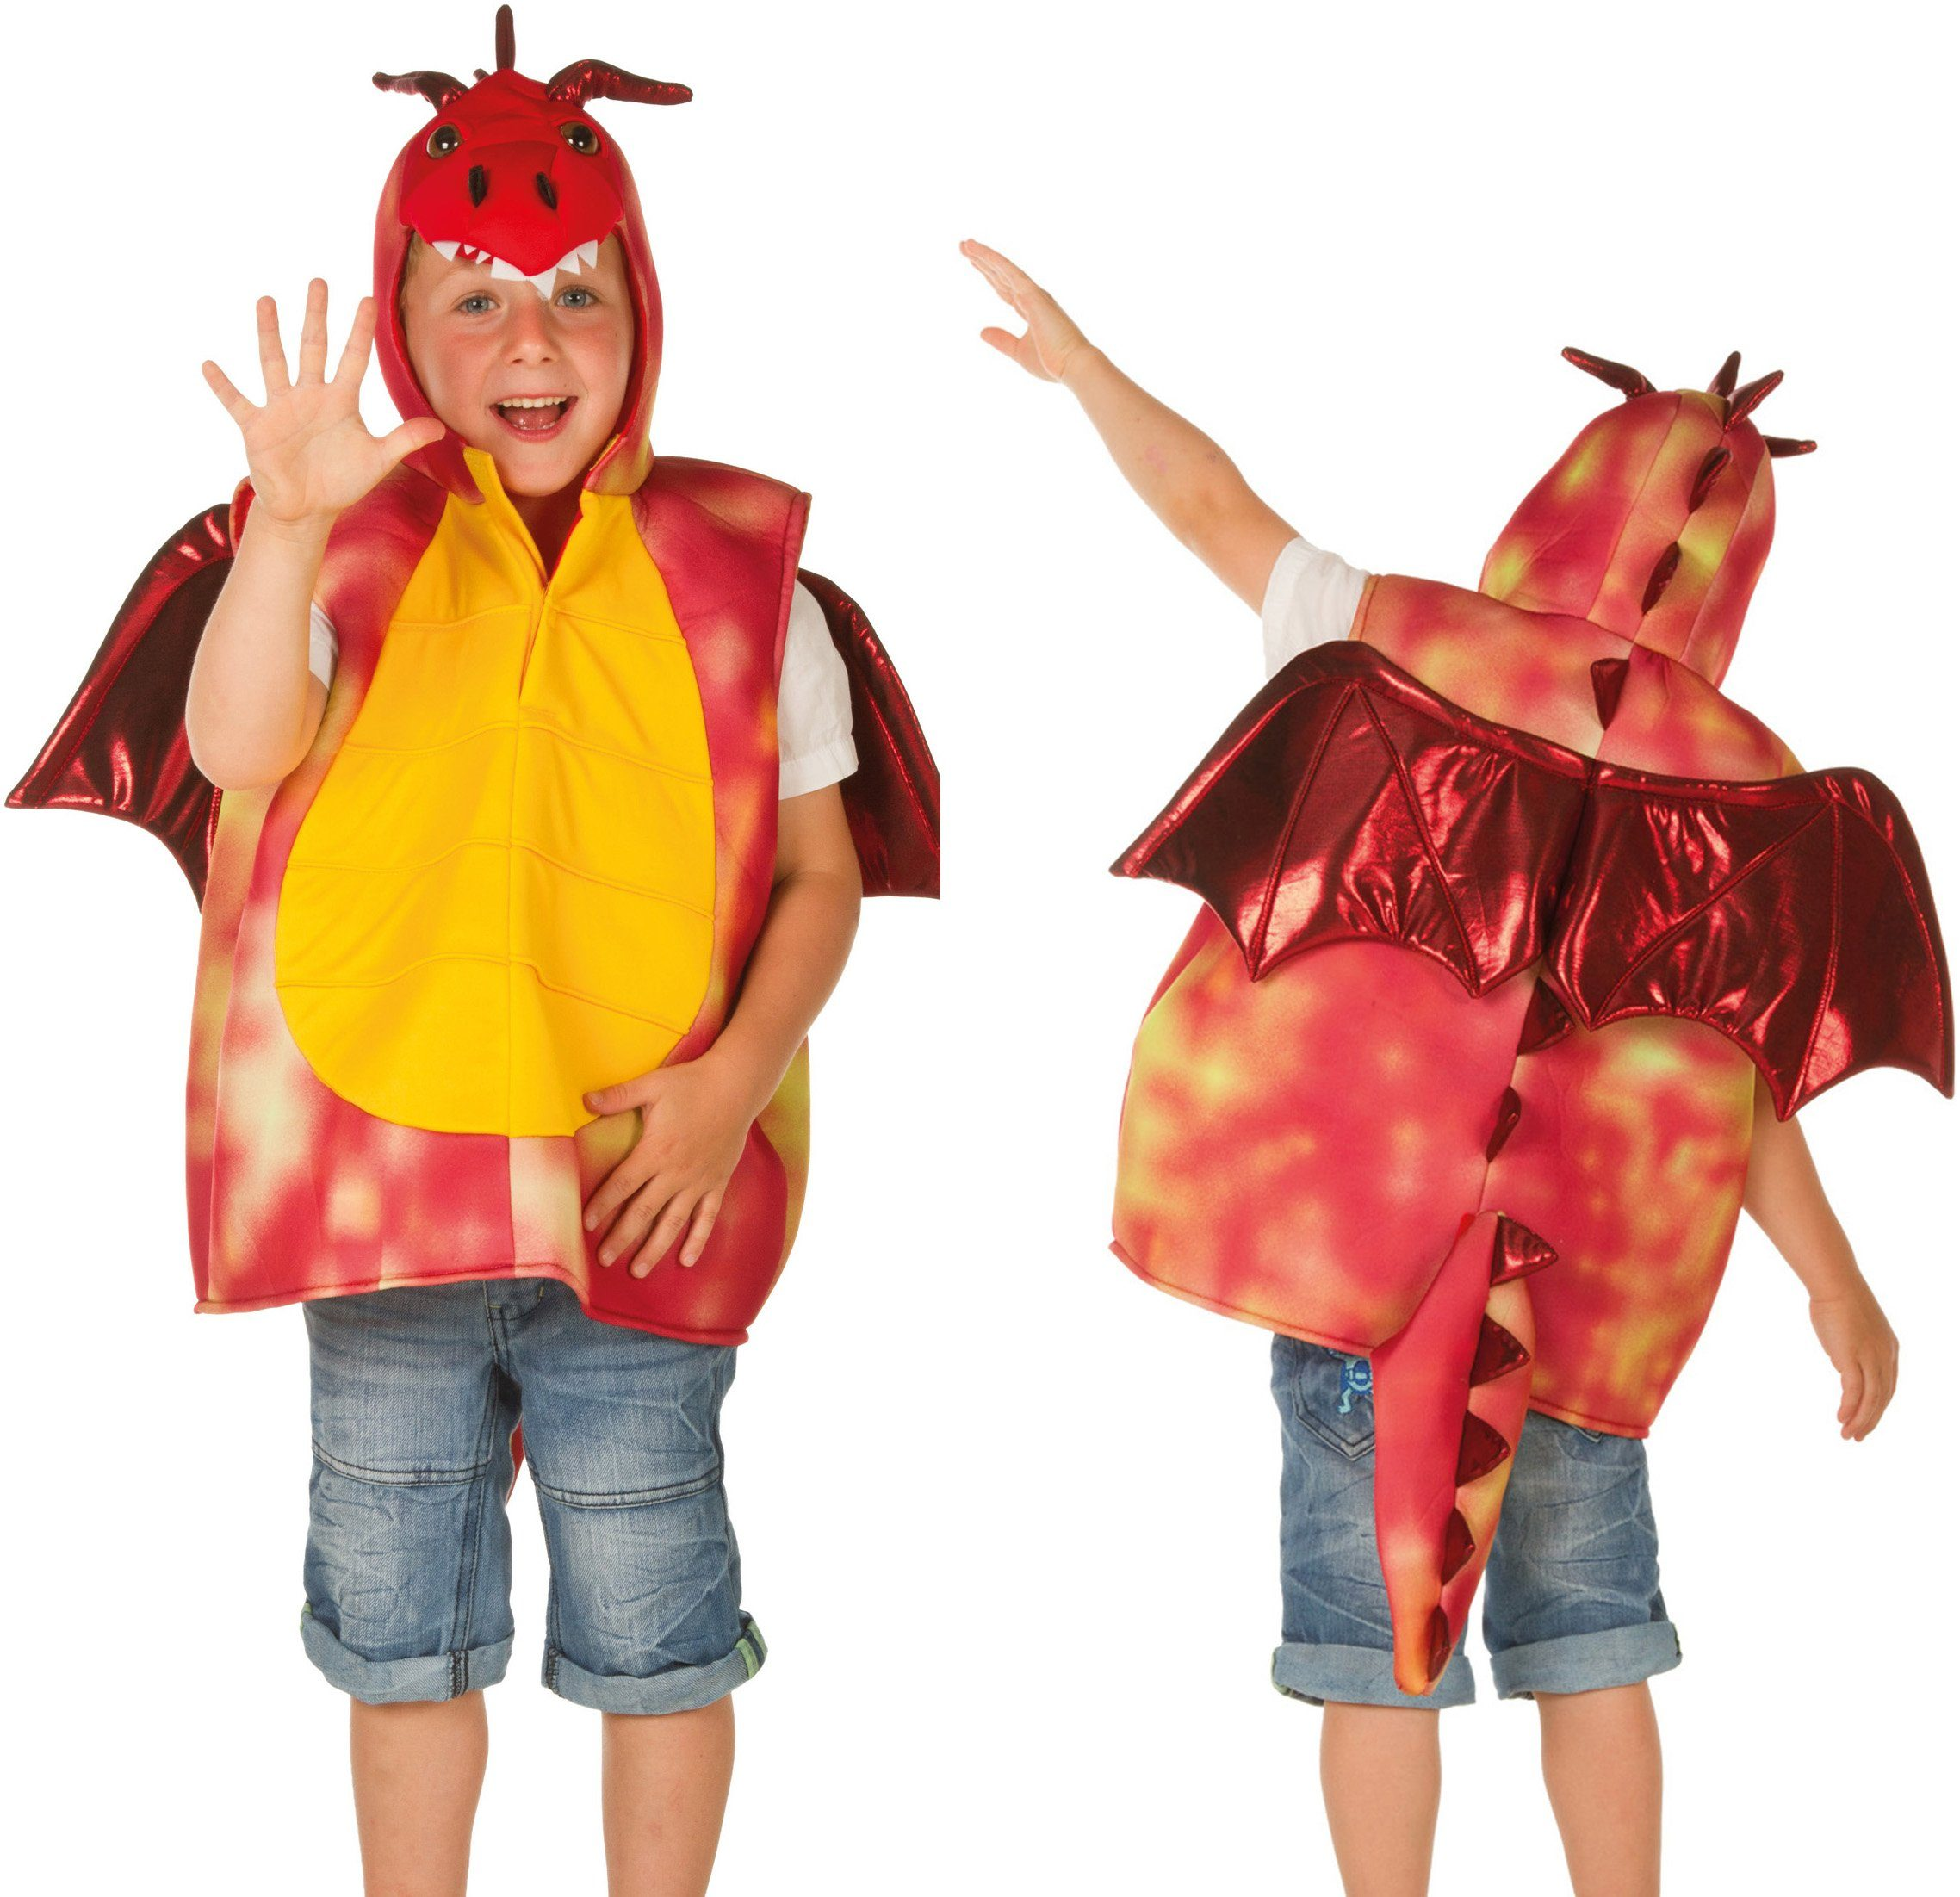 Heunec Karneval Kostüm für Kinder, Größe 128, »Kostüm-Weste Drache rot«